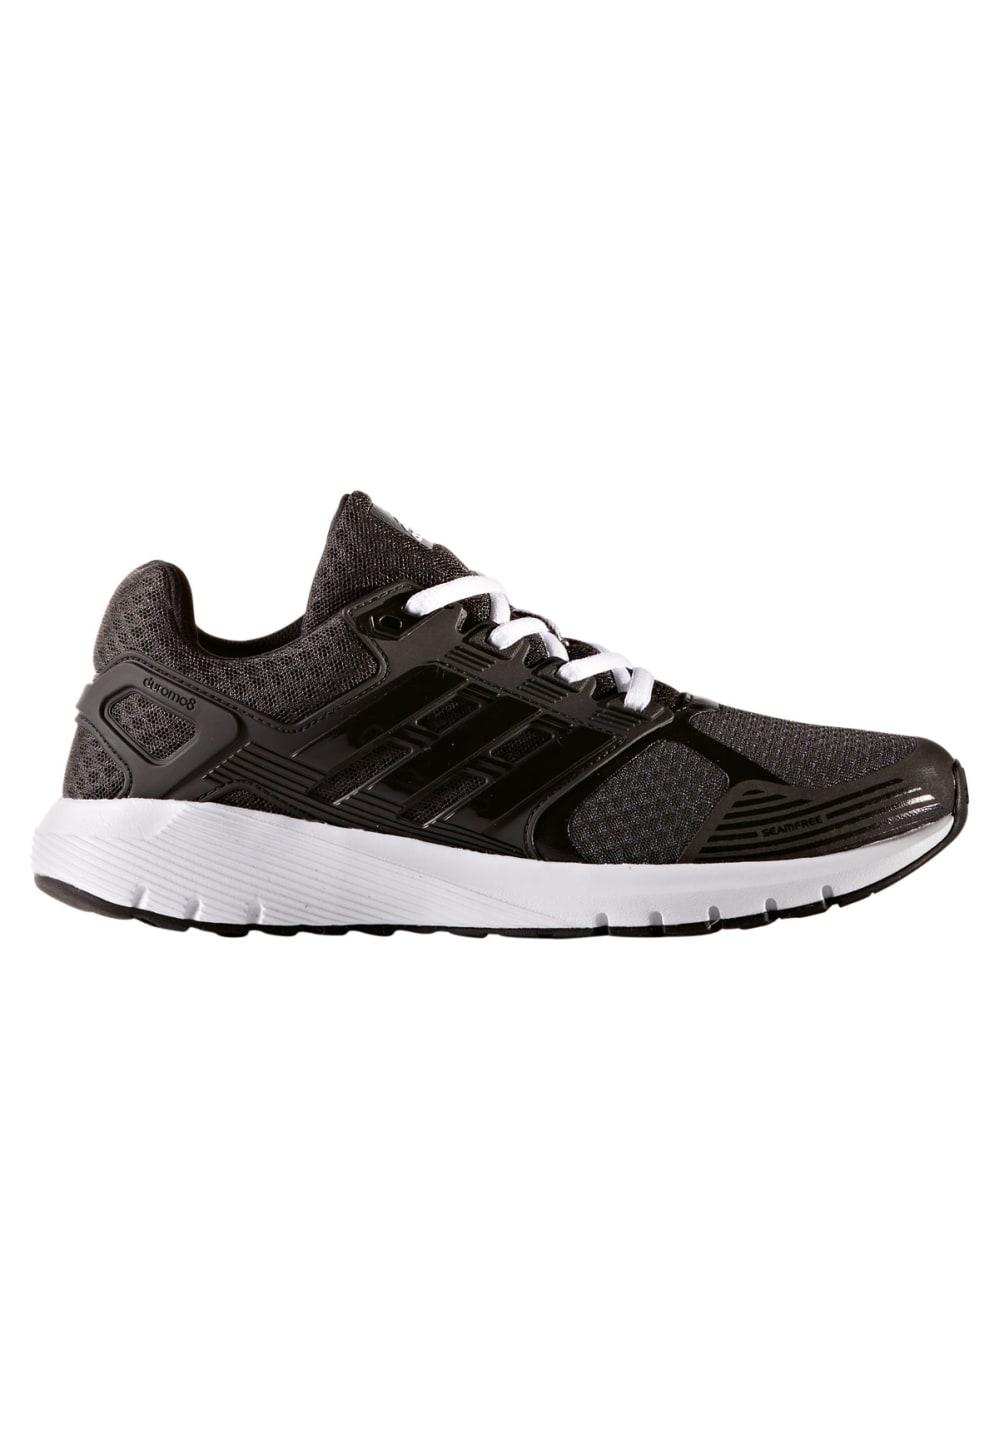 Adidas Duramo 8 Femmes Chaussures running